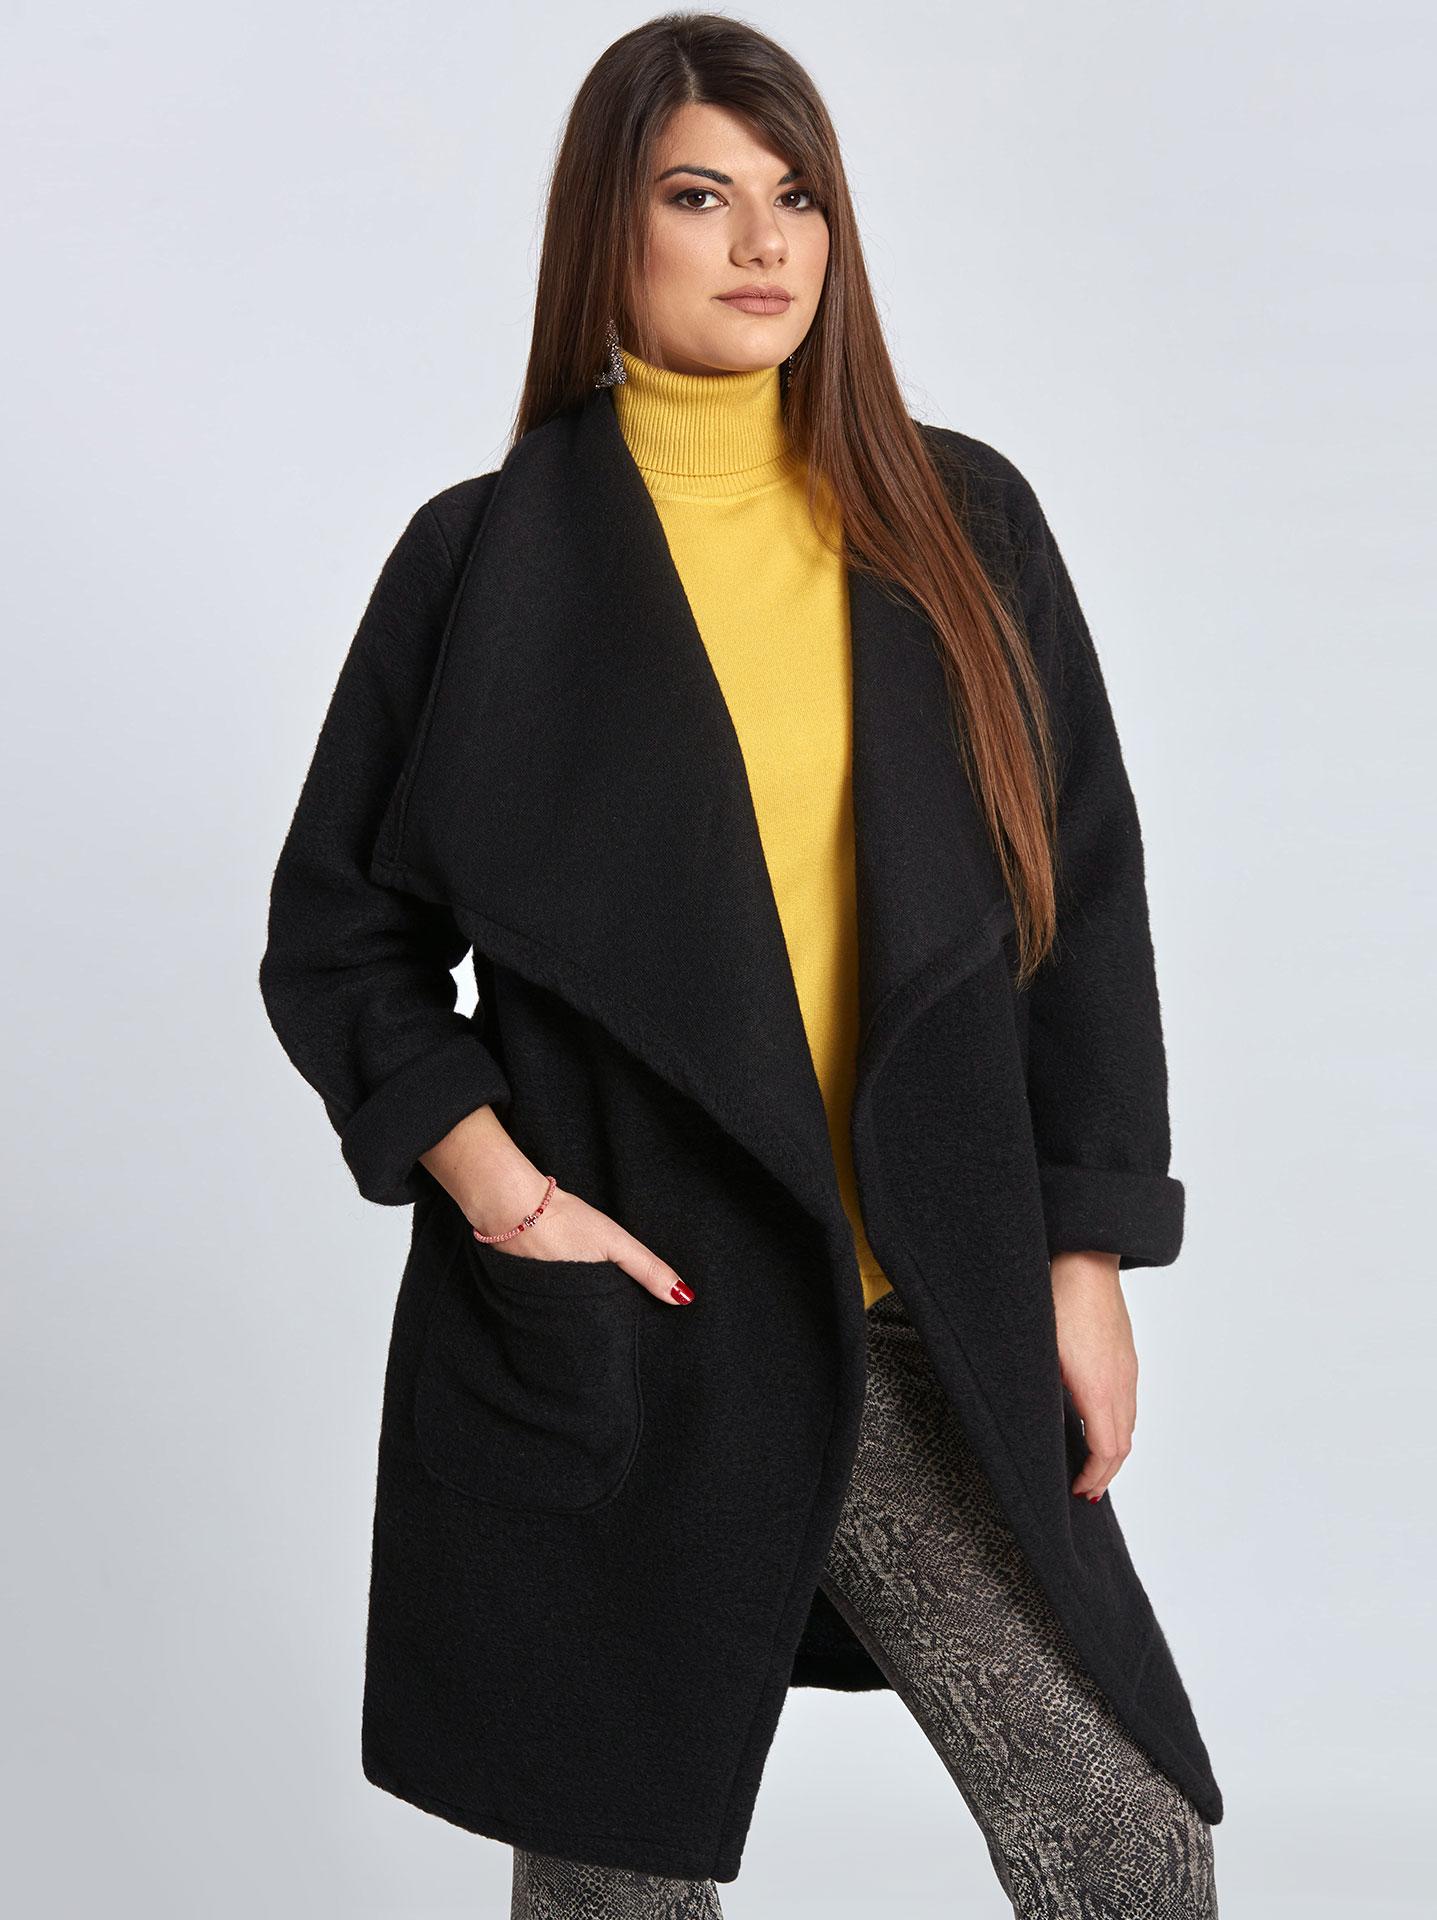 9bf4d6ee32b5 Μπουκλέ παλτό με τσέπες curvy σε μαυρο